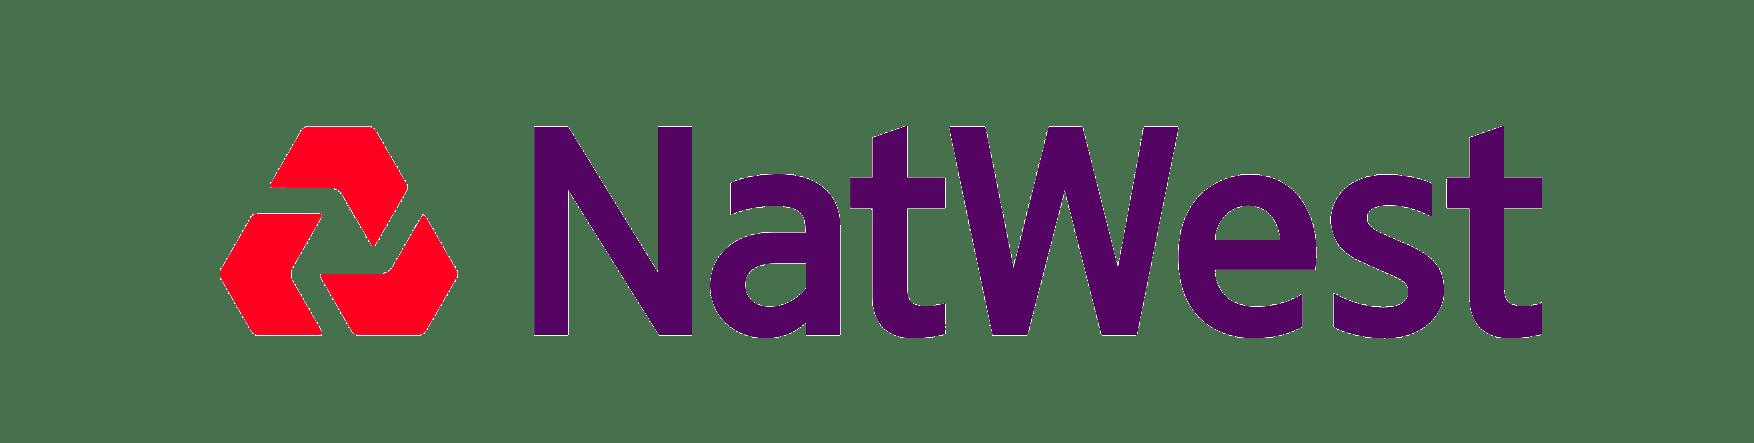 natwest logo trustist customer reviews